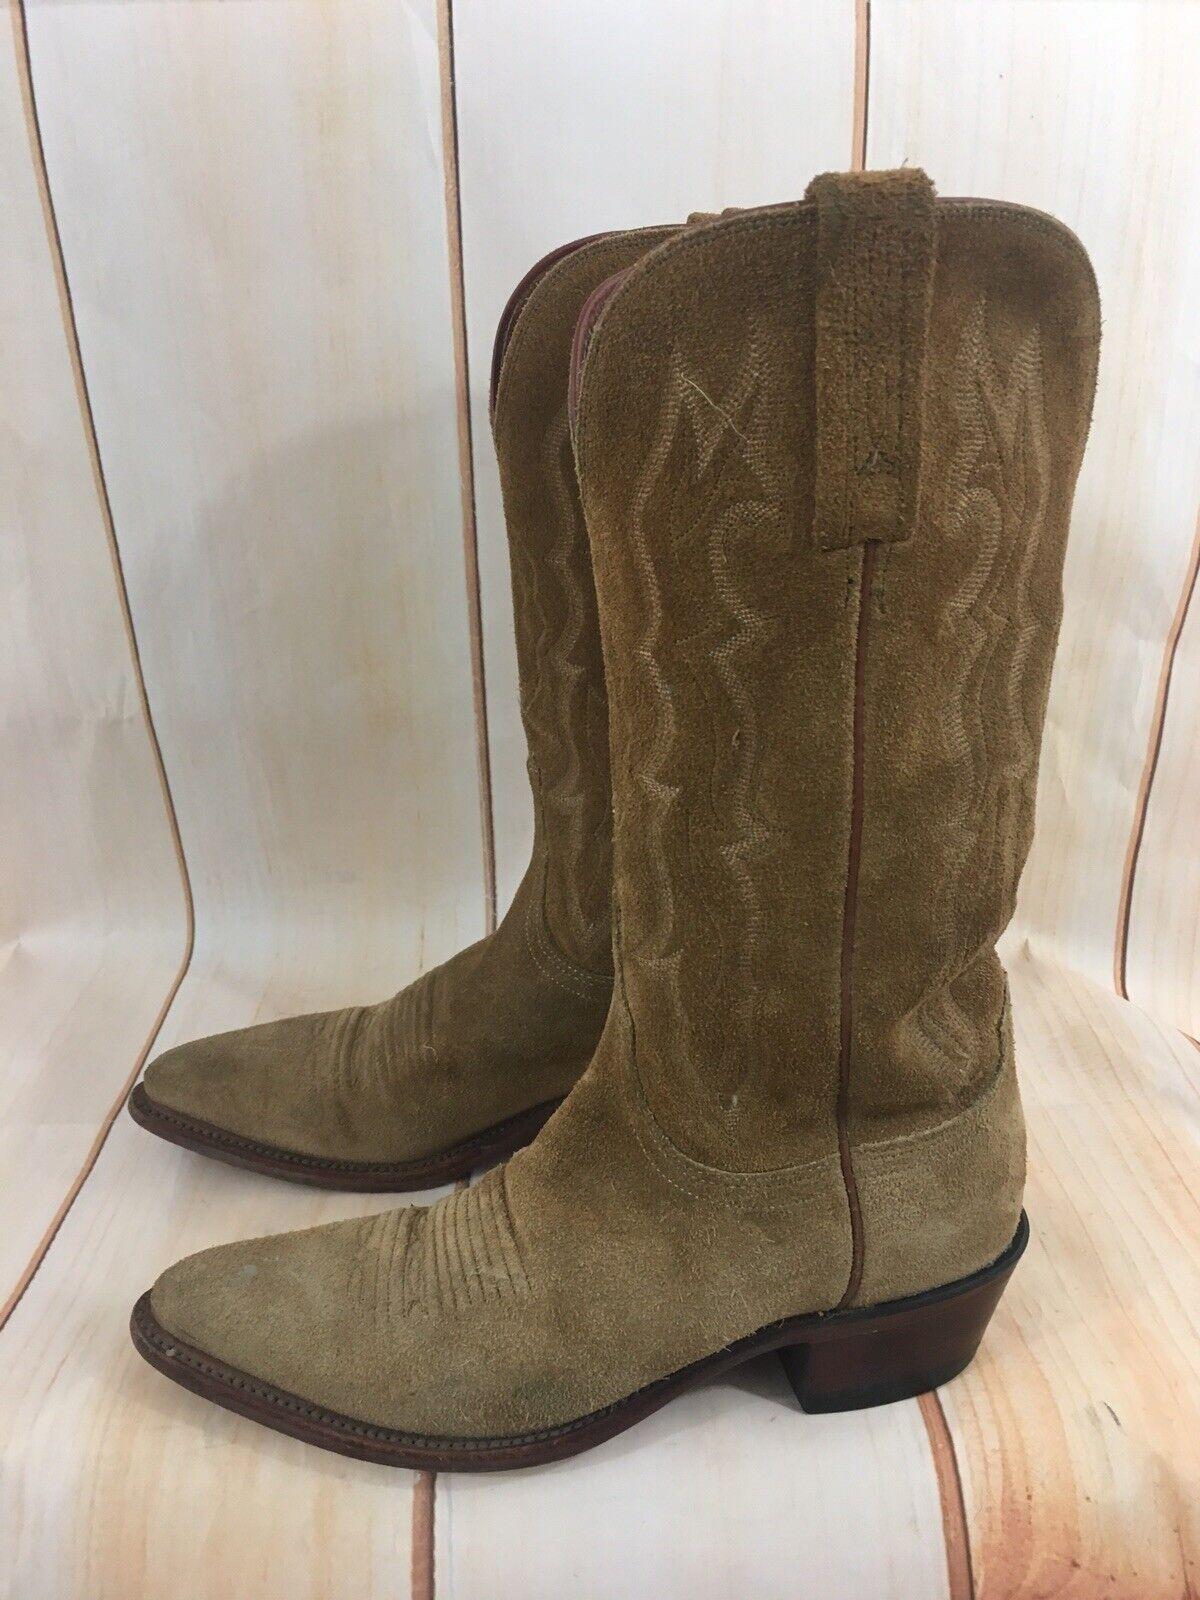 Lucchese para mujer botas de Vaquero 1883 Gamuza Cuero Marrón botas B